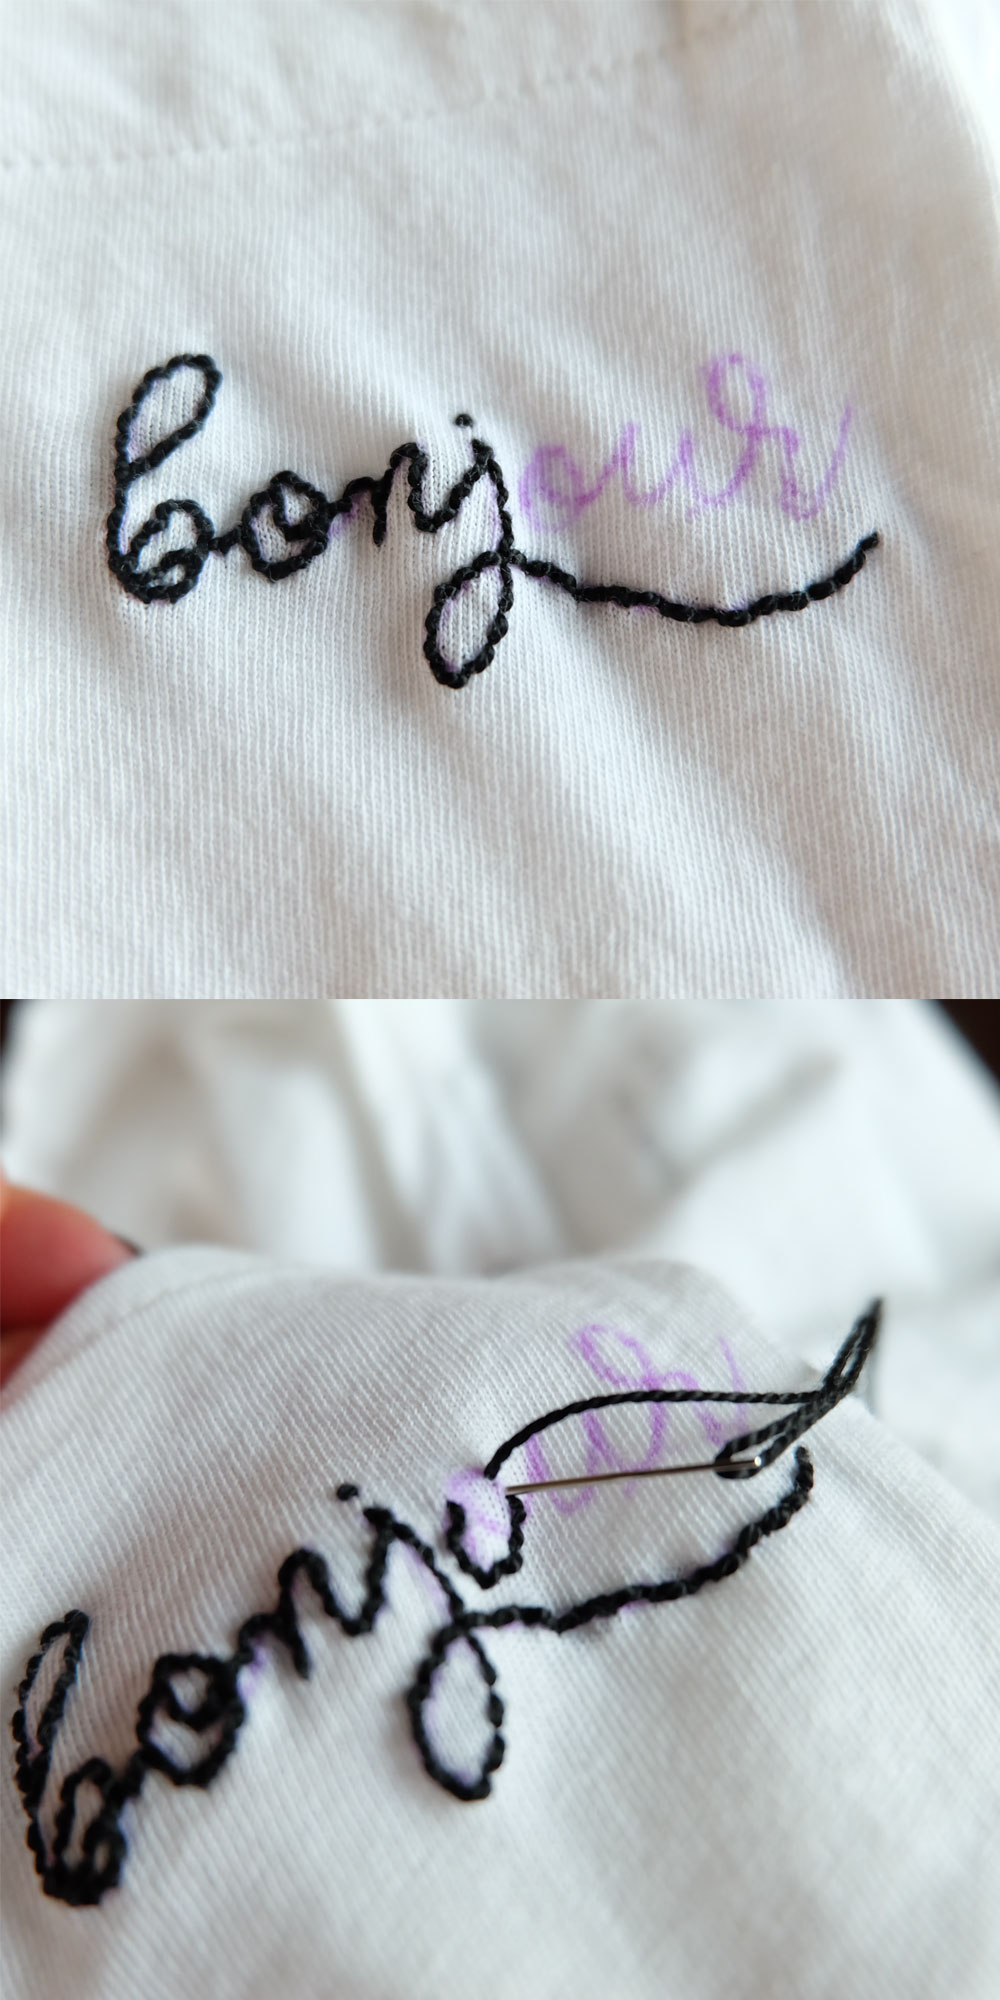 Old Navy Boyfriend Pocket Tee with DIY Embroidered Graphic, Fun Fashion DIY!